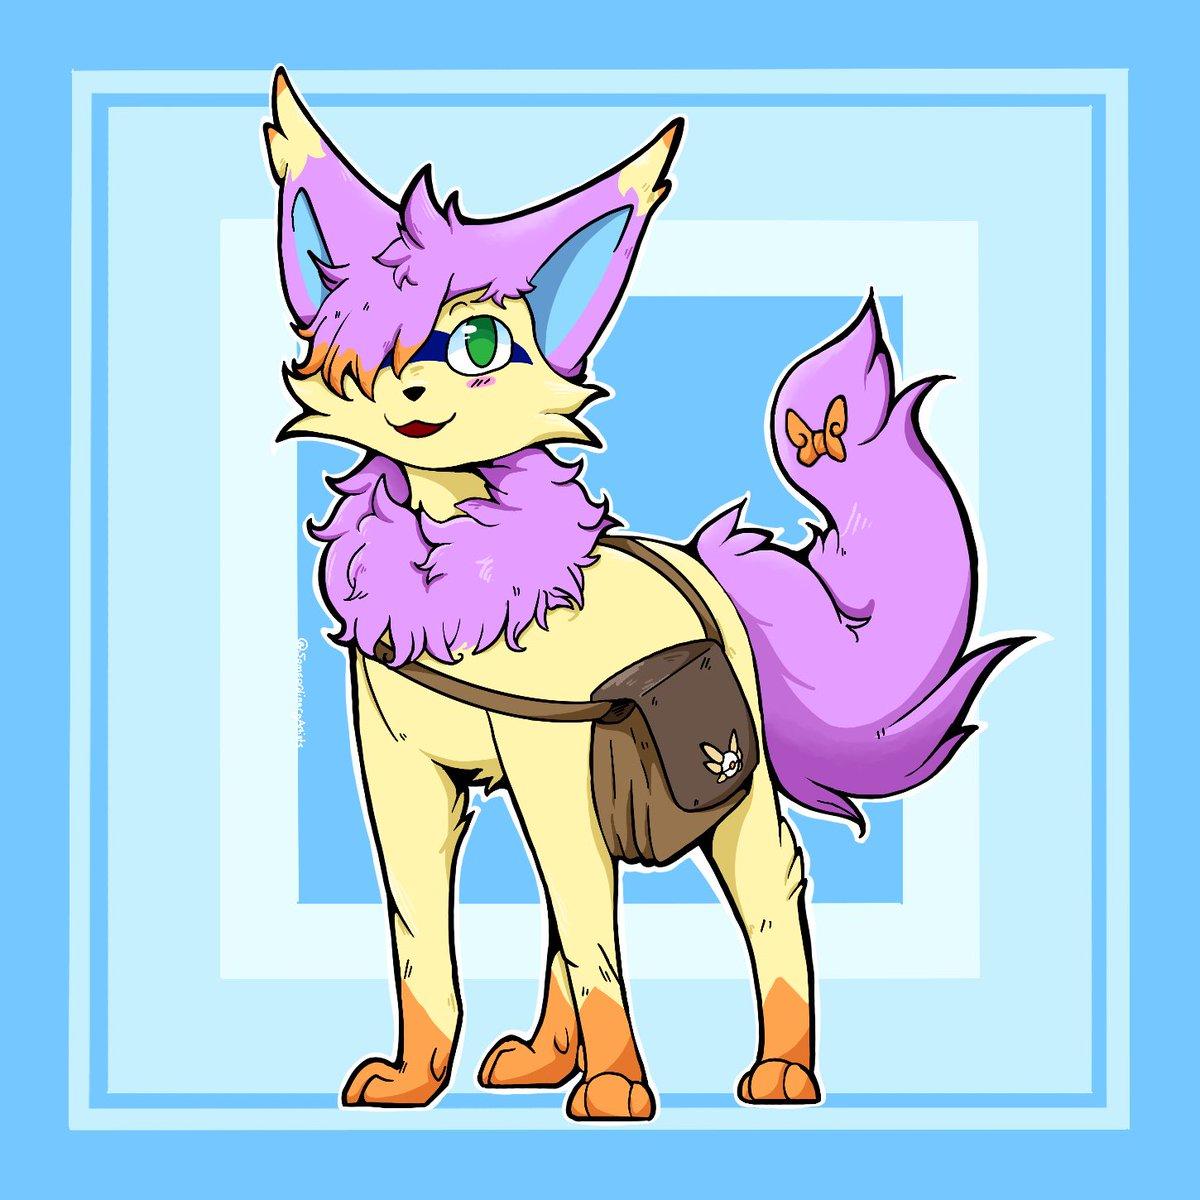 RT @SoraPMD: Raffle prize for @Ariya_N_Twinkle !!  #pokemon https://t.co/5kEB71T7CX